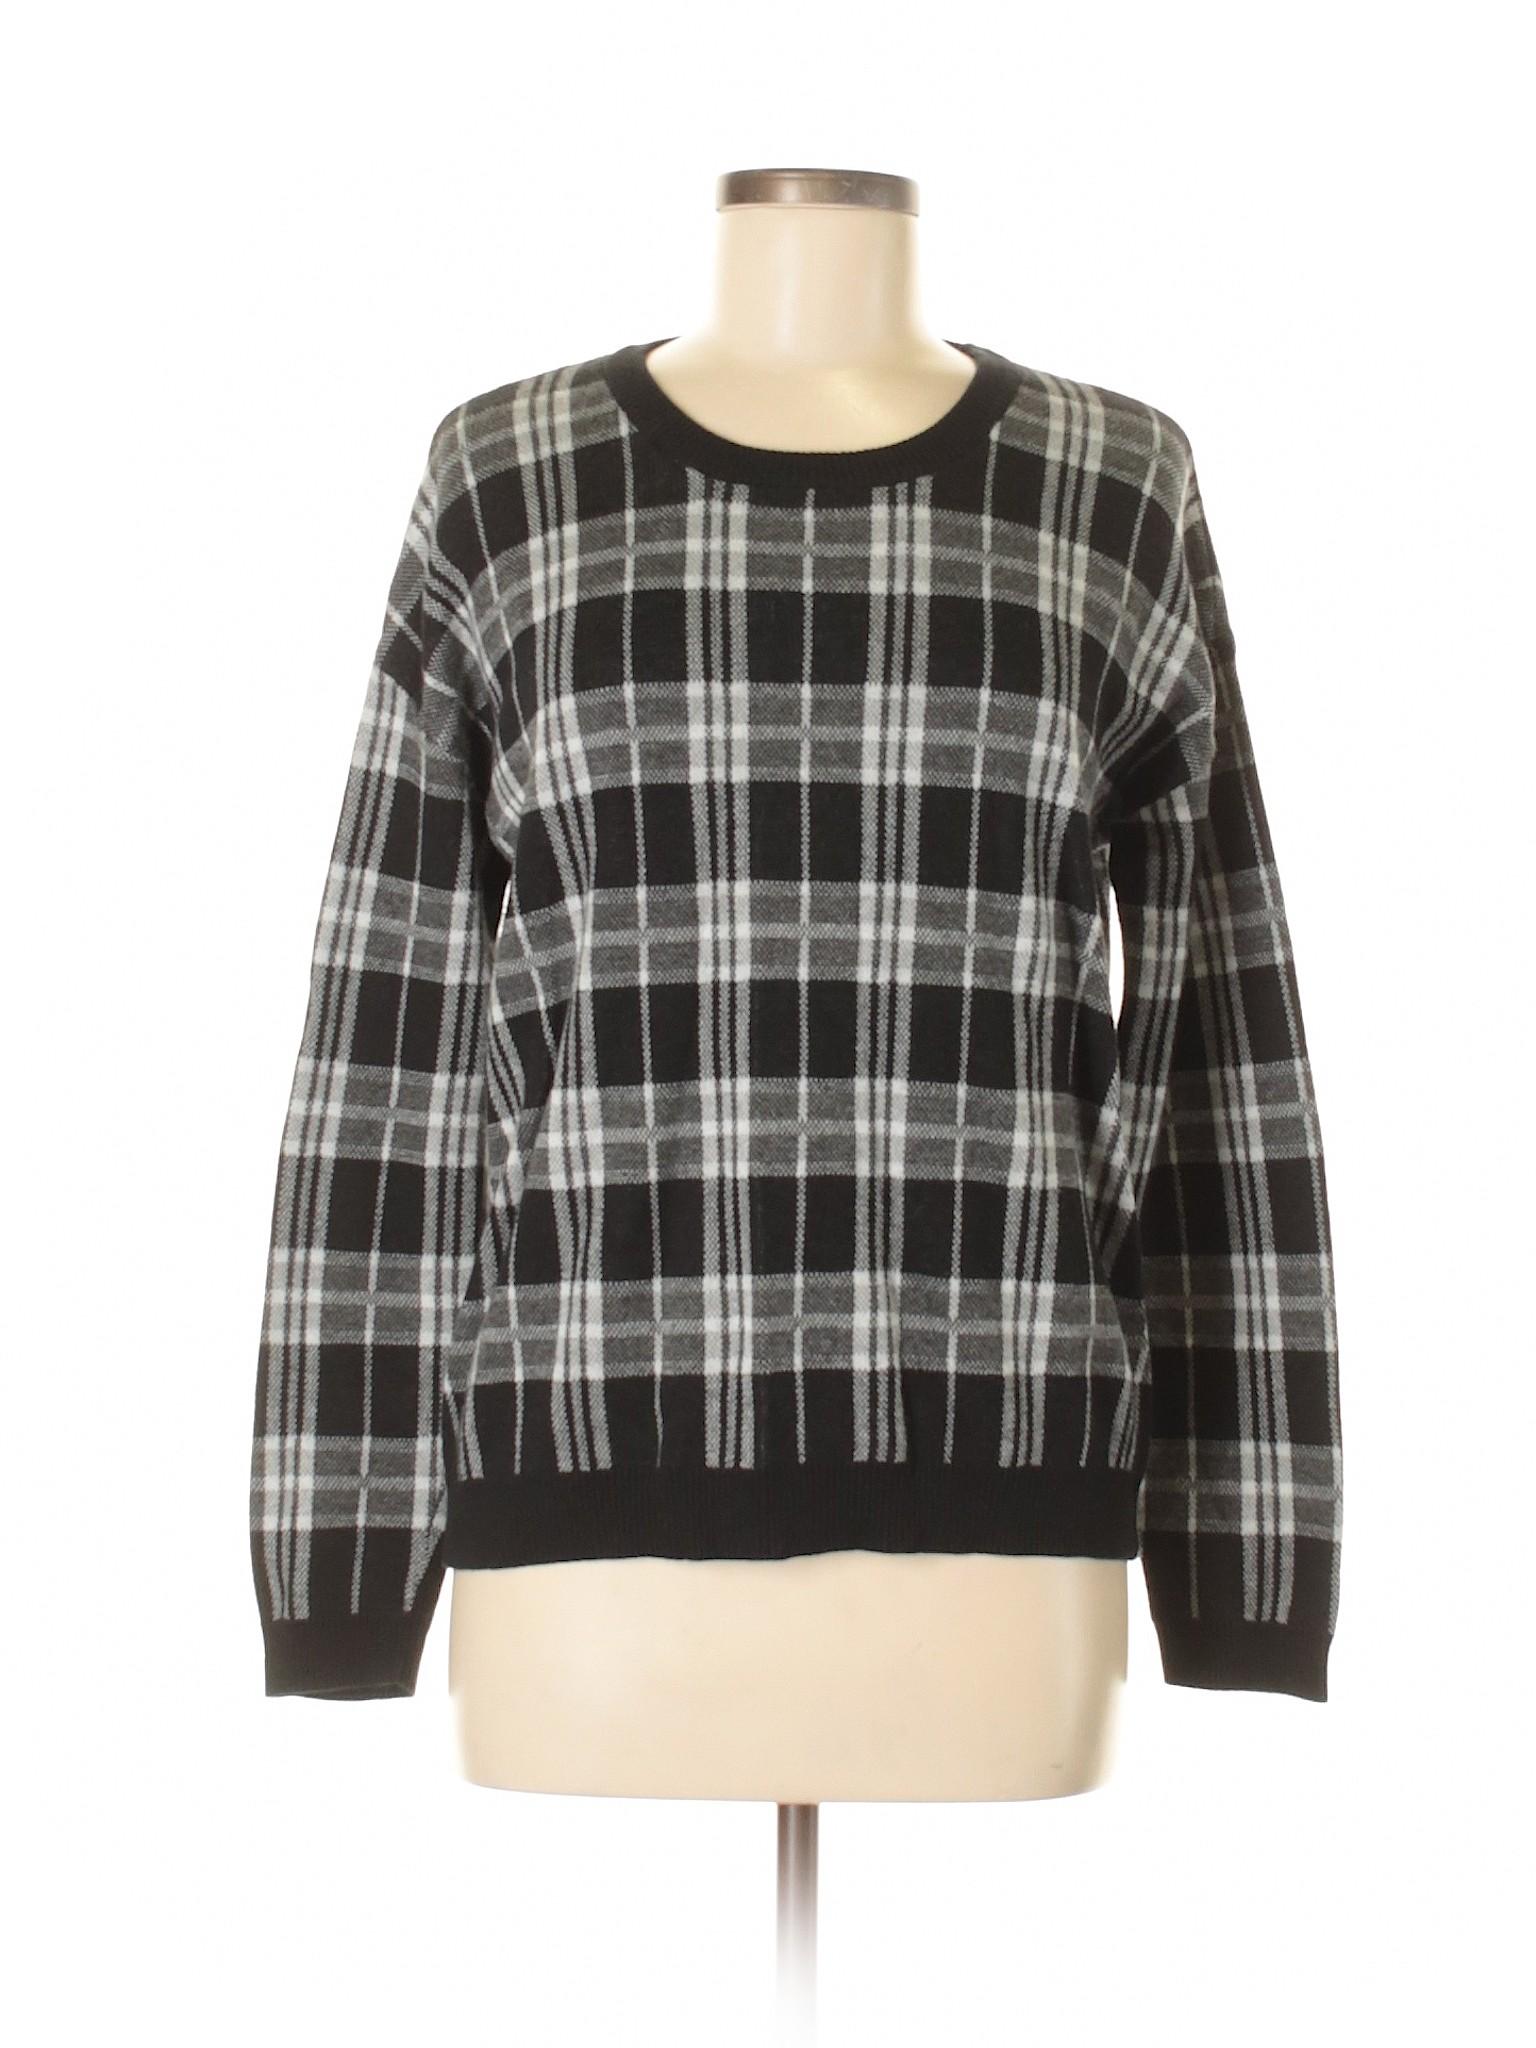 Pullover Sweater Boutique Winter Bcbgeneration Boutique Winter wqFv0BI